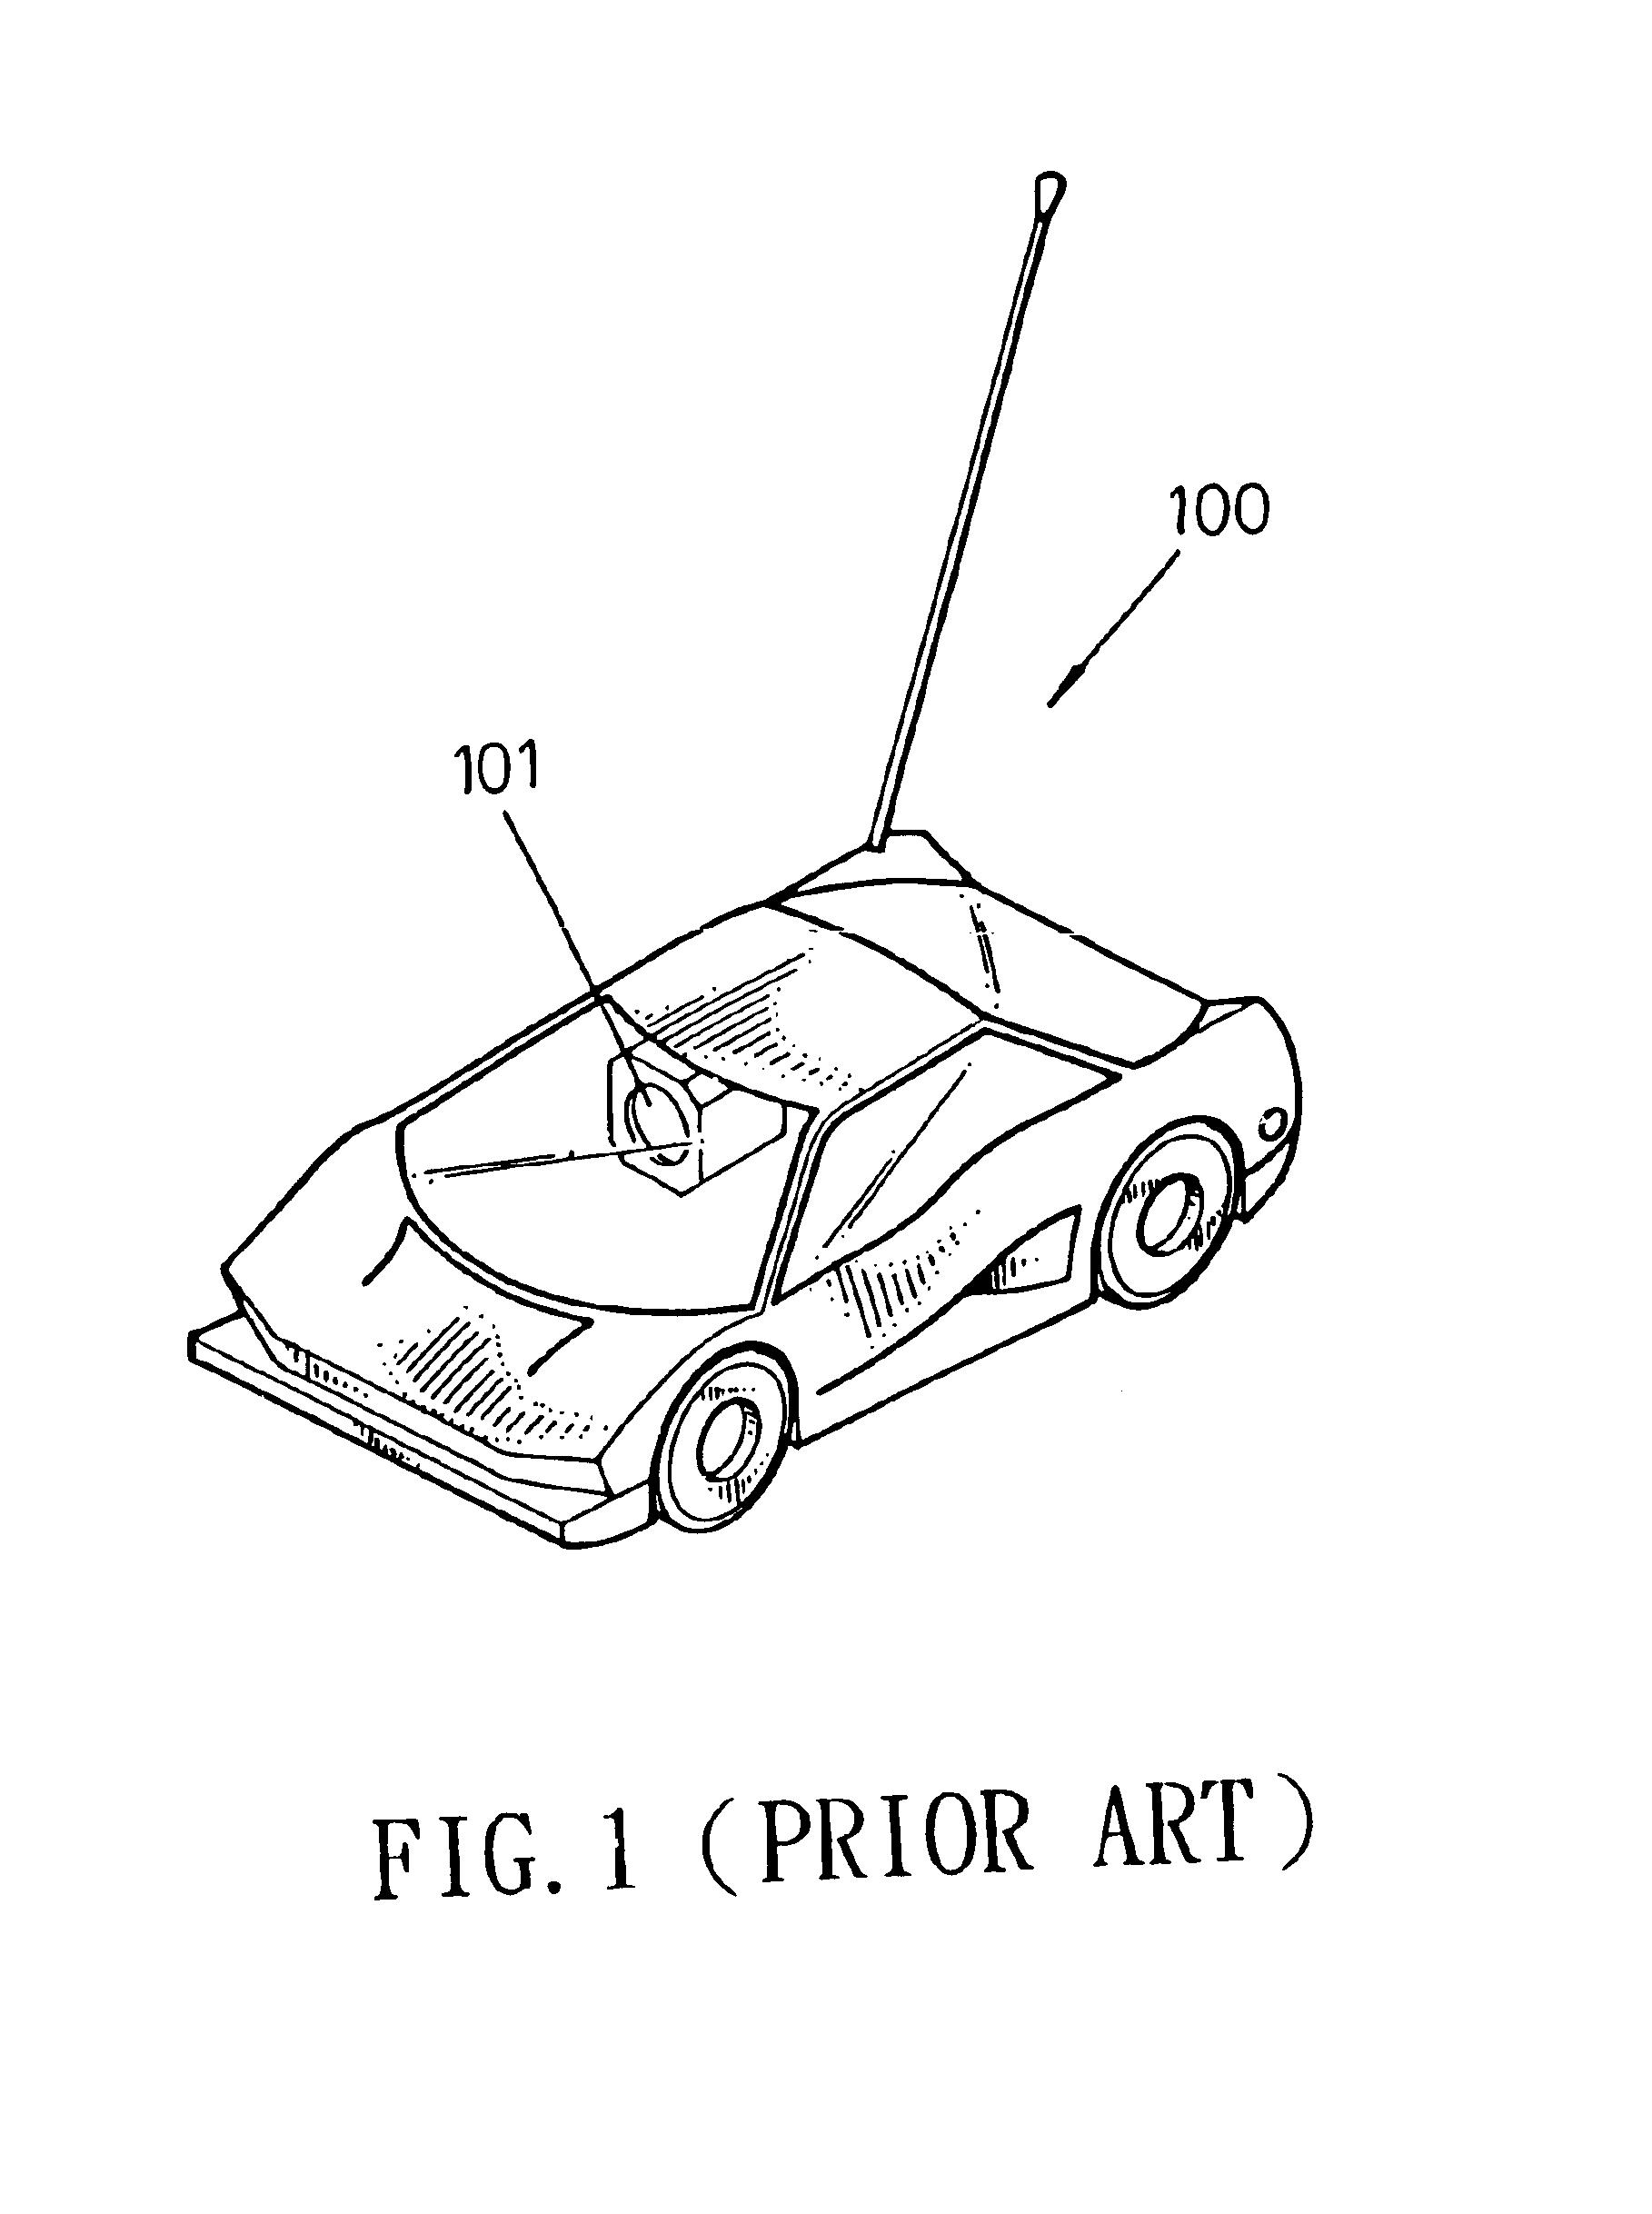 patent us6746304 - remote-control toy car set